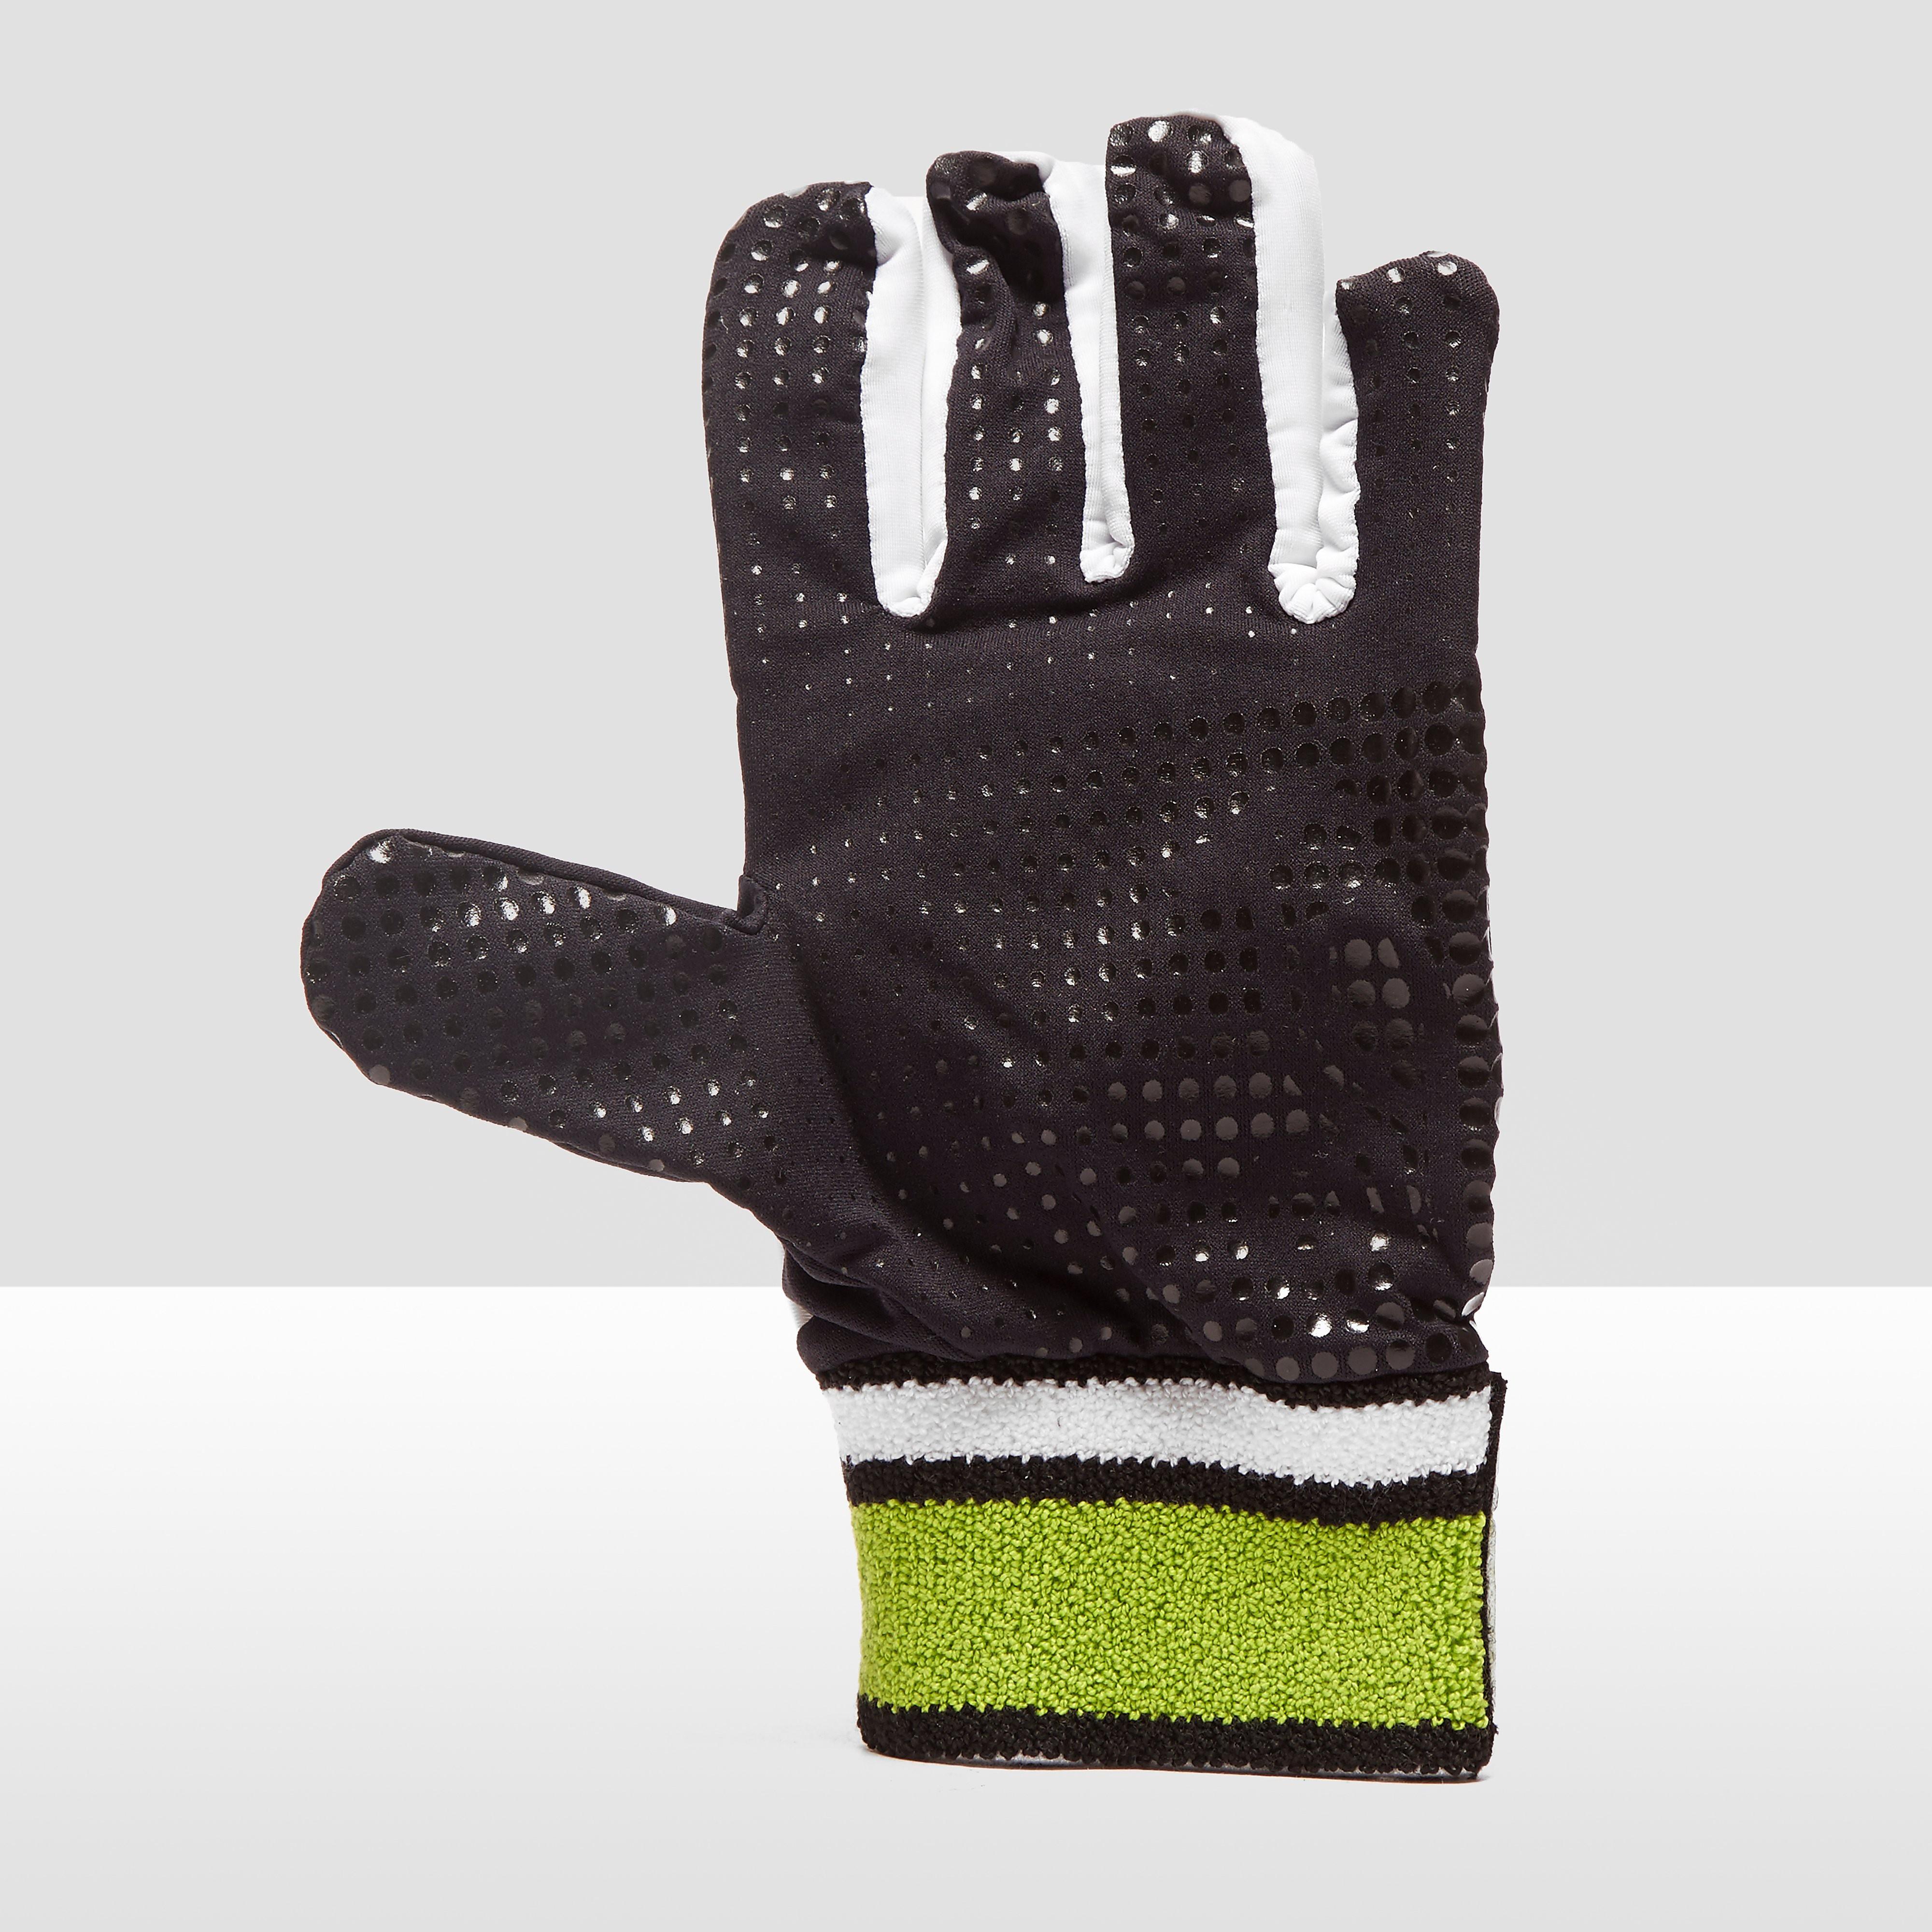 Kookaburra Duel Left Hand Hockey Glove